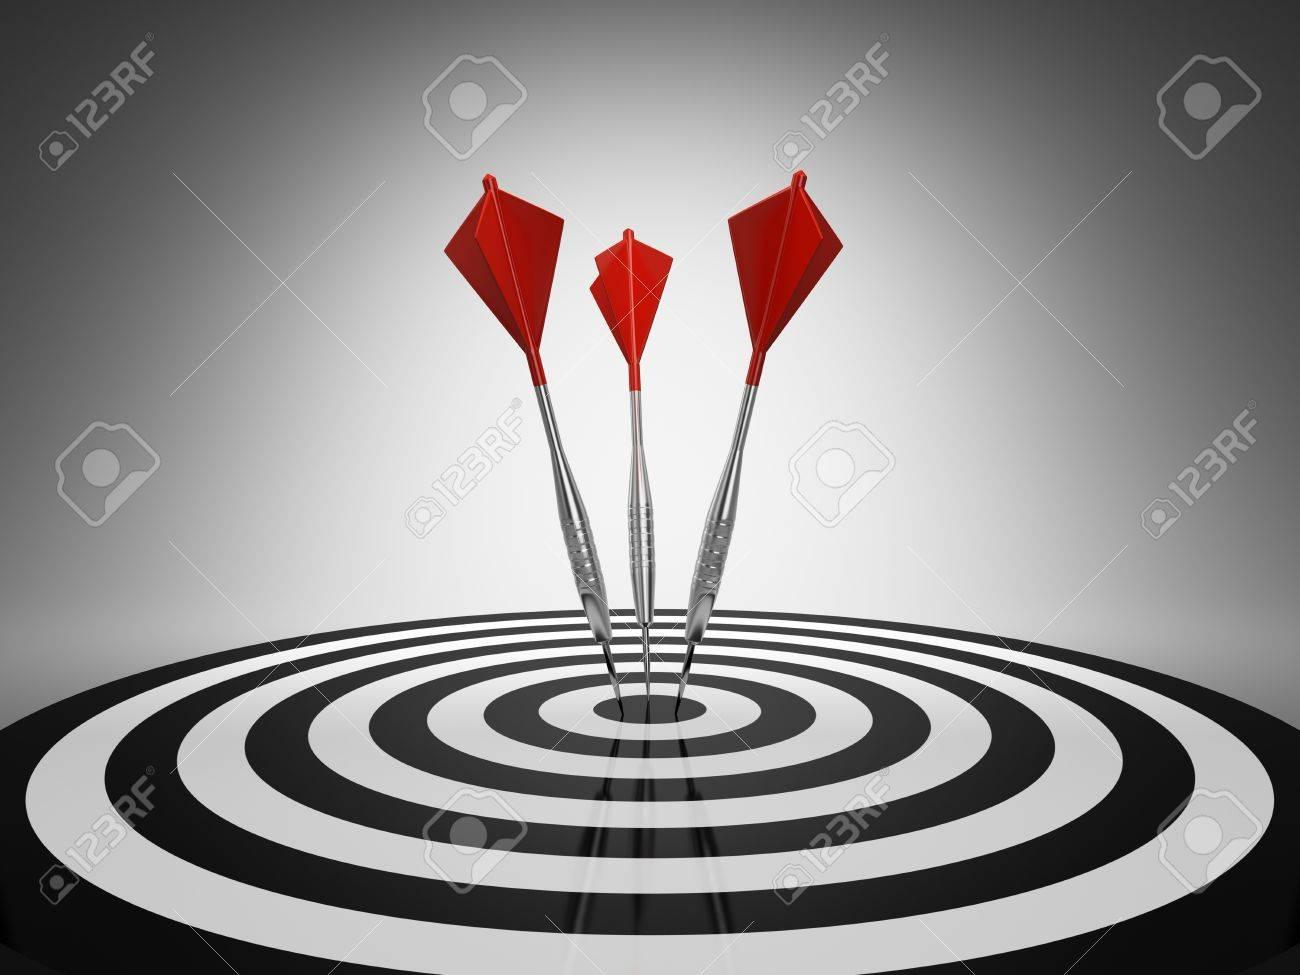 Dart hitting a target on black background Stock Photo - 9325113